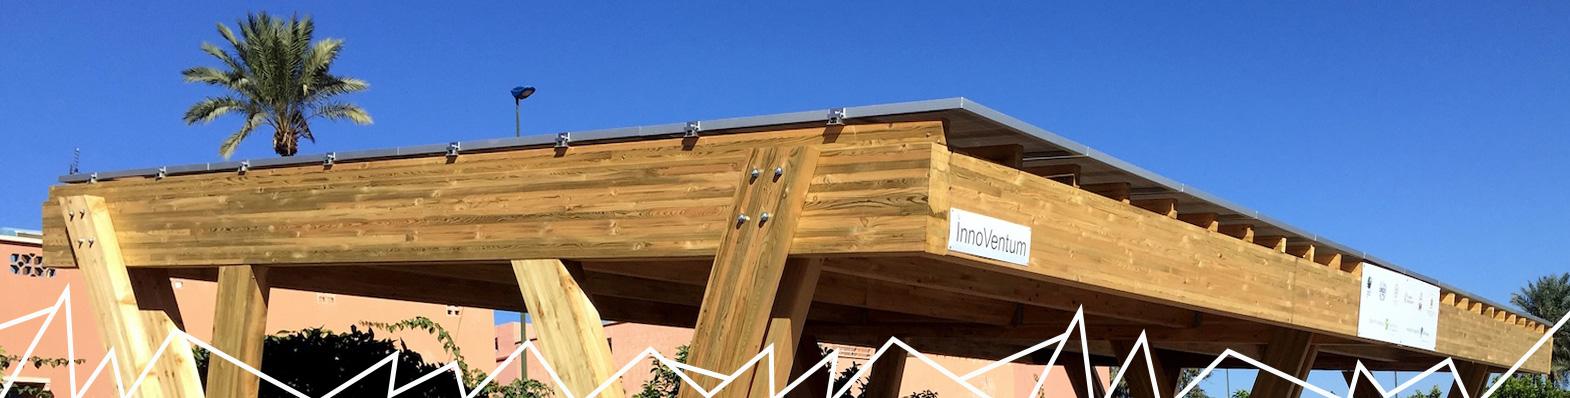 Wooden solar carport structure